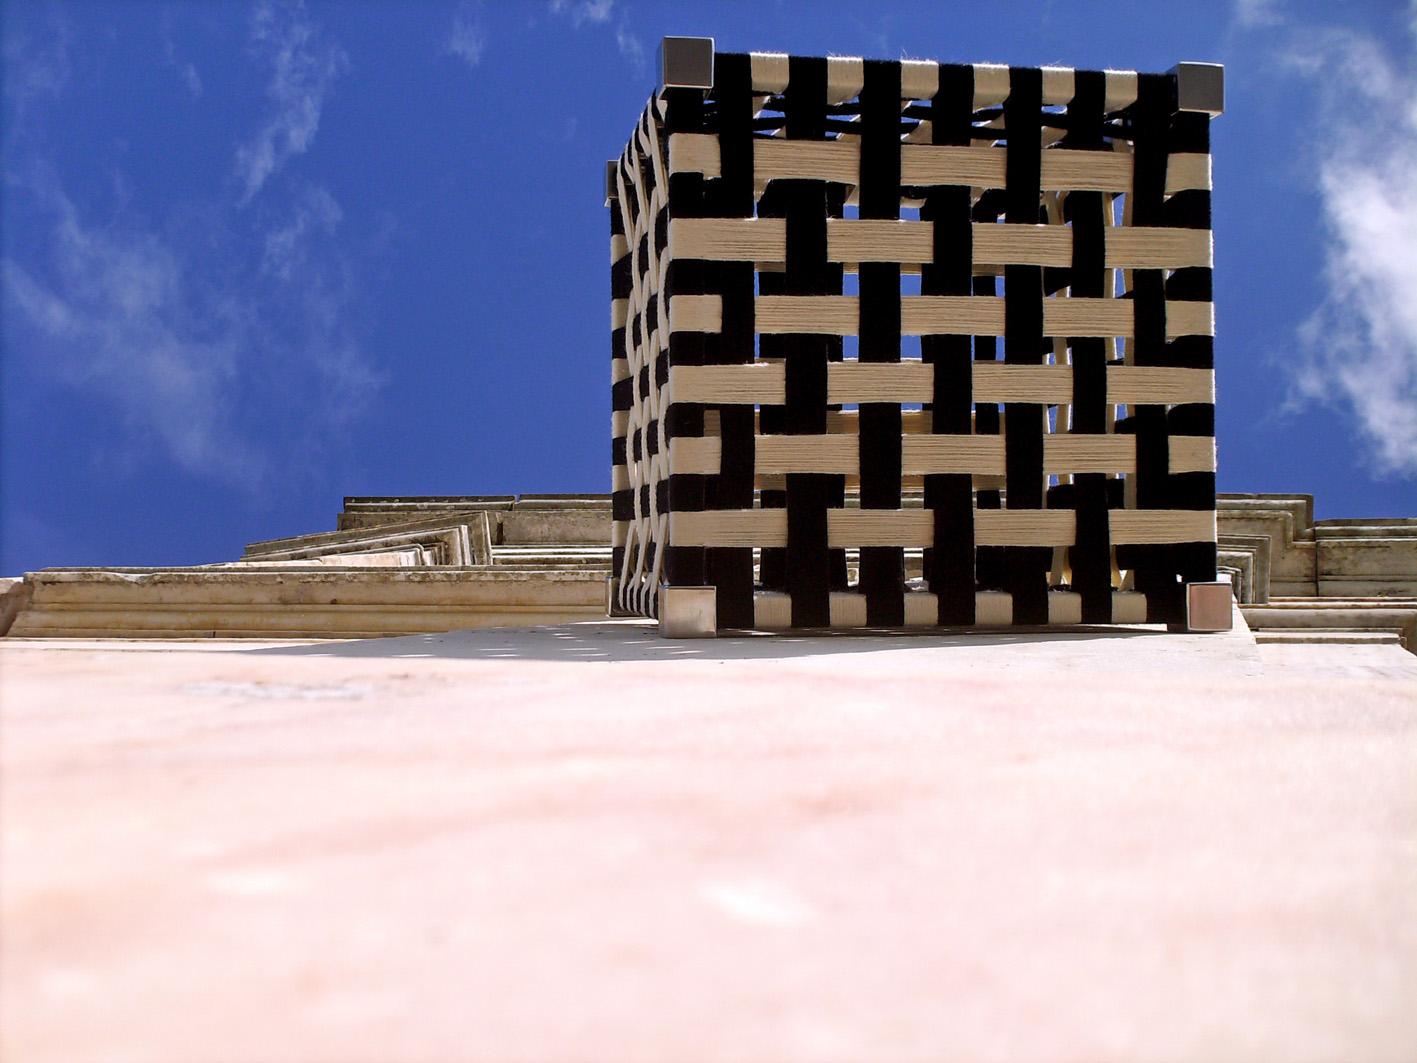 ÀGUA DE PRATA-stainless steel wool cube